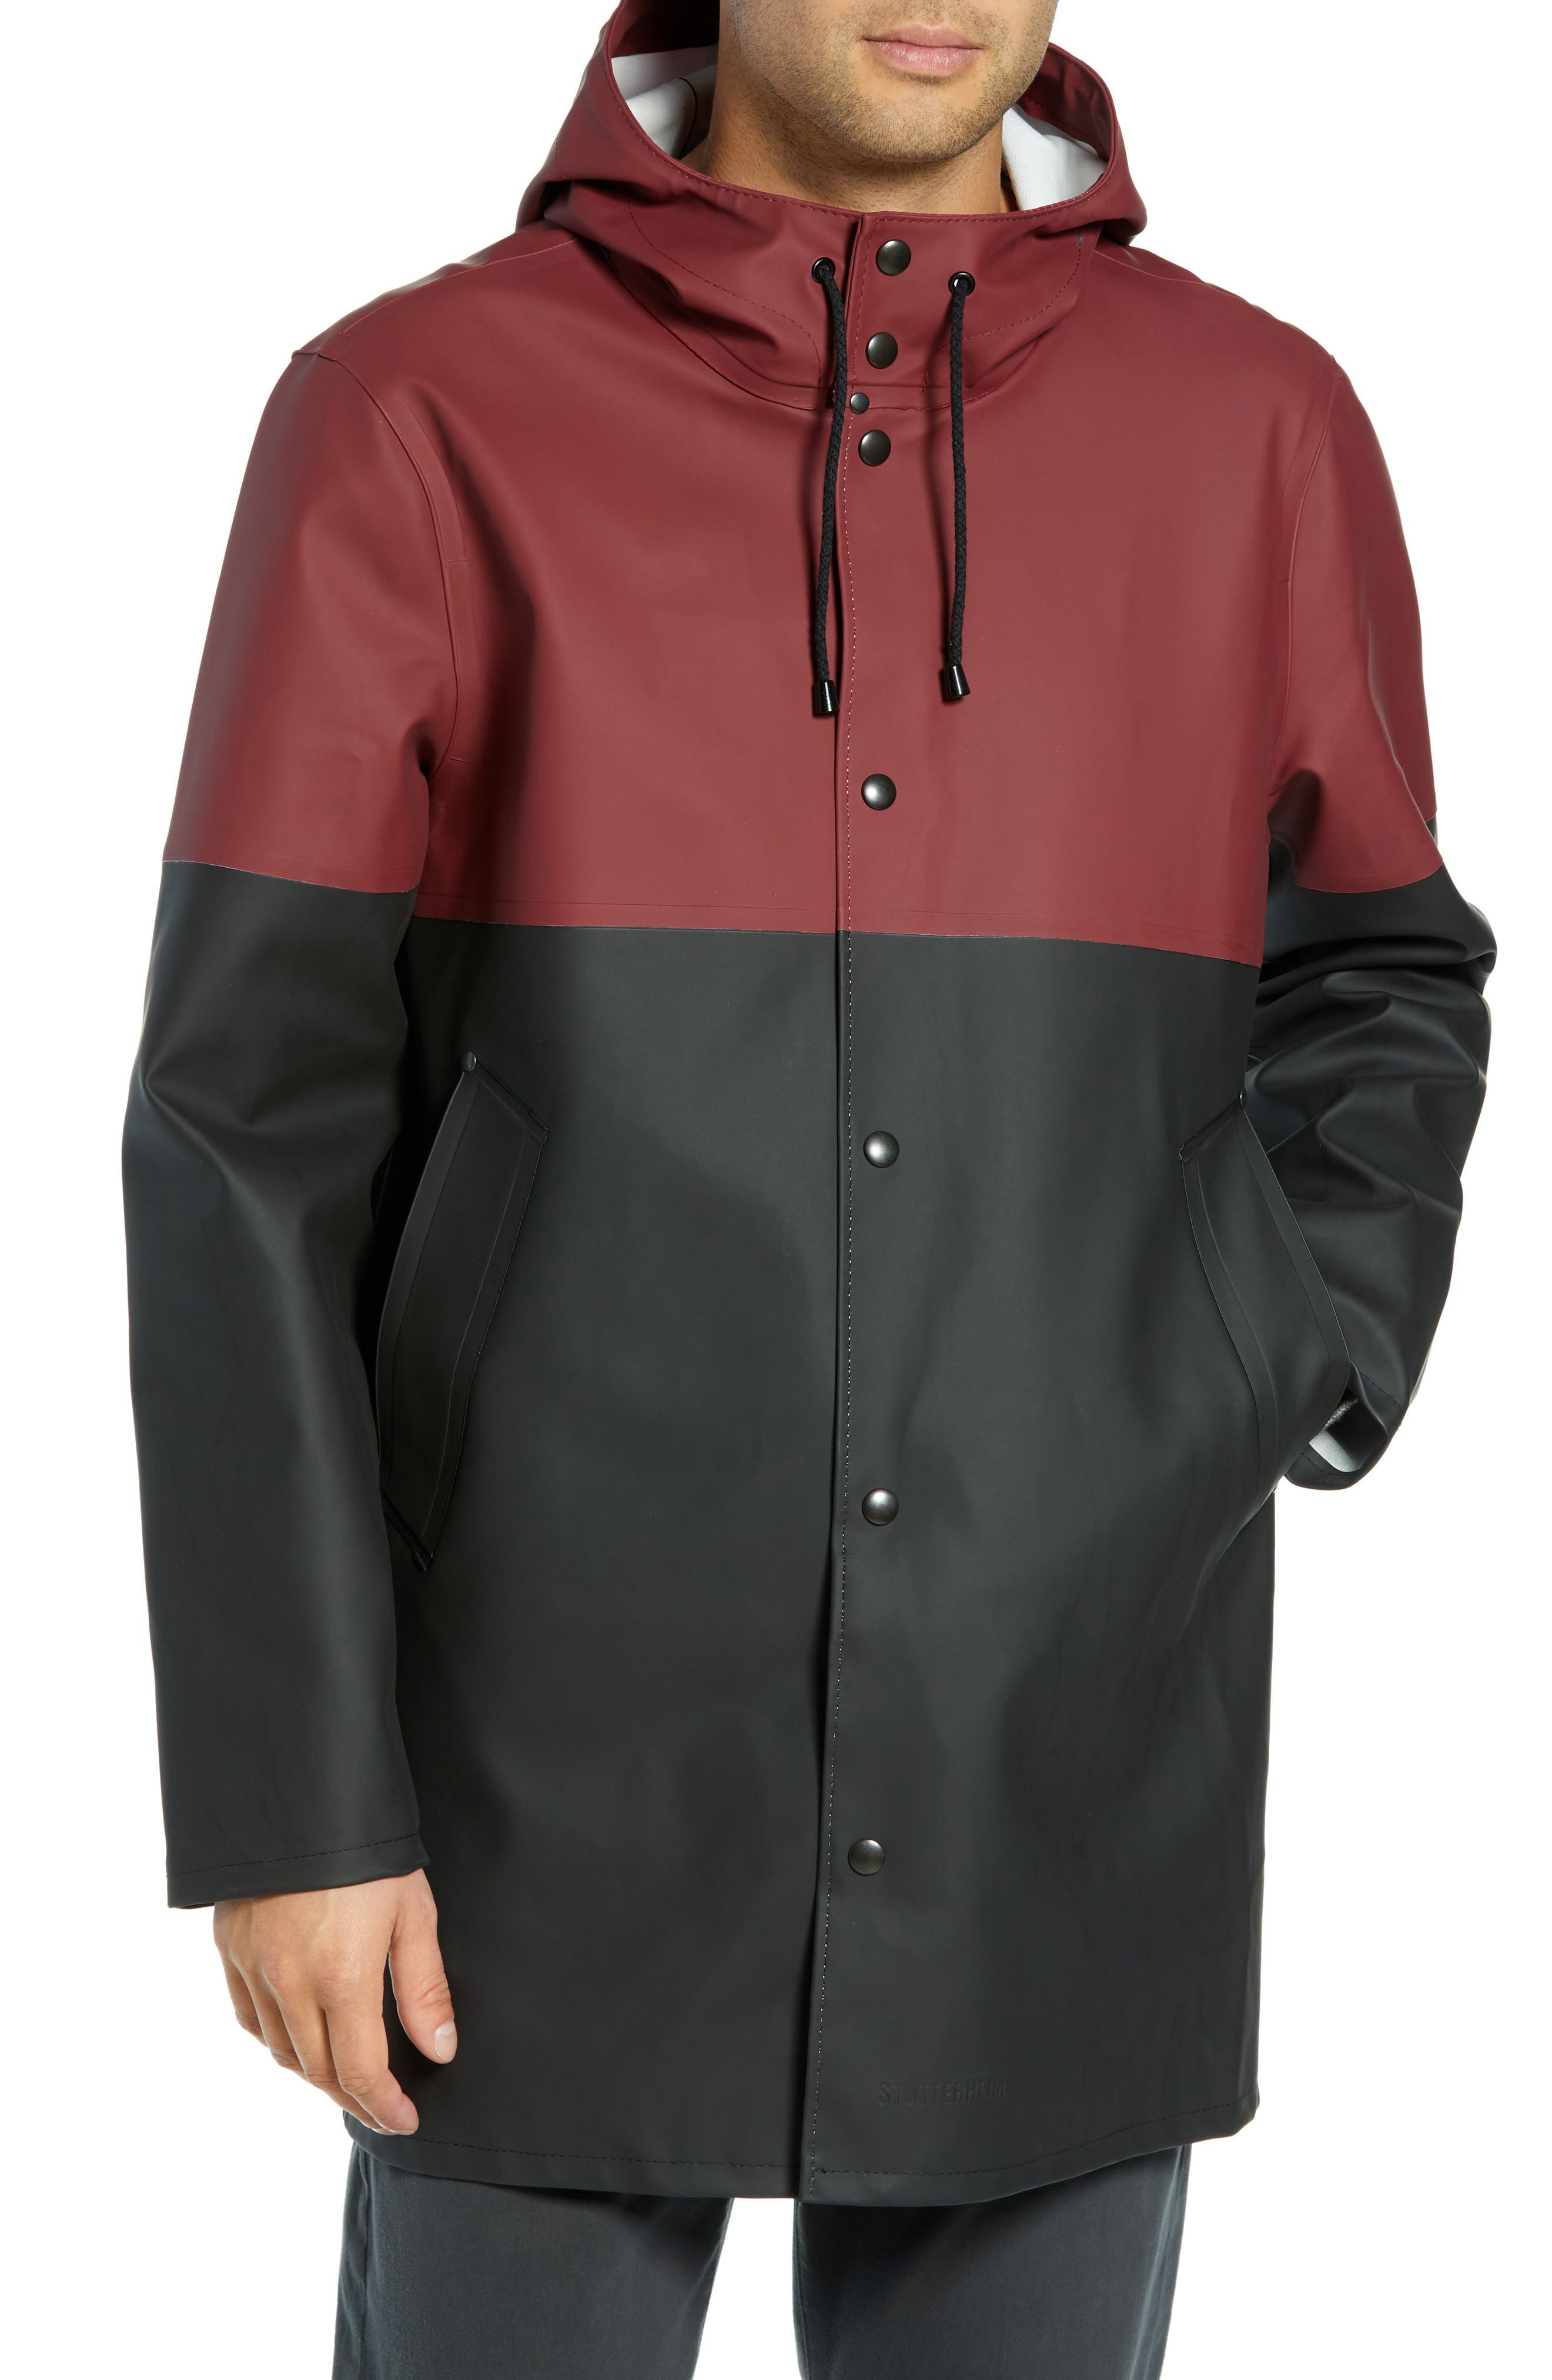 Stockholm Colorblock Waterproof Hooded Raincoat,                             Alternate thumbnail 4, color,                             BURGUNDY/ BLACK